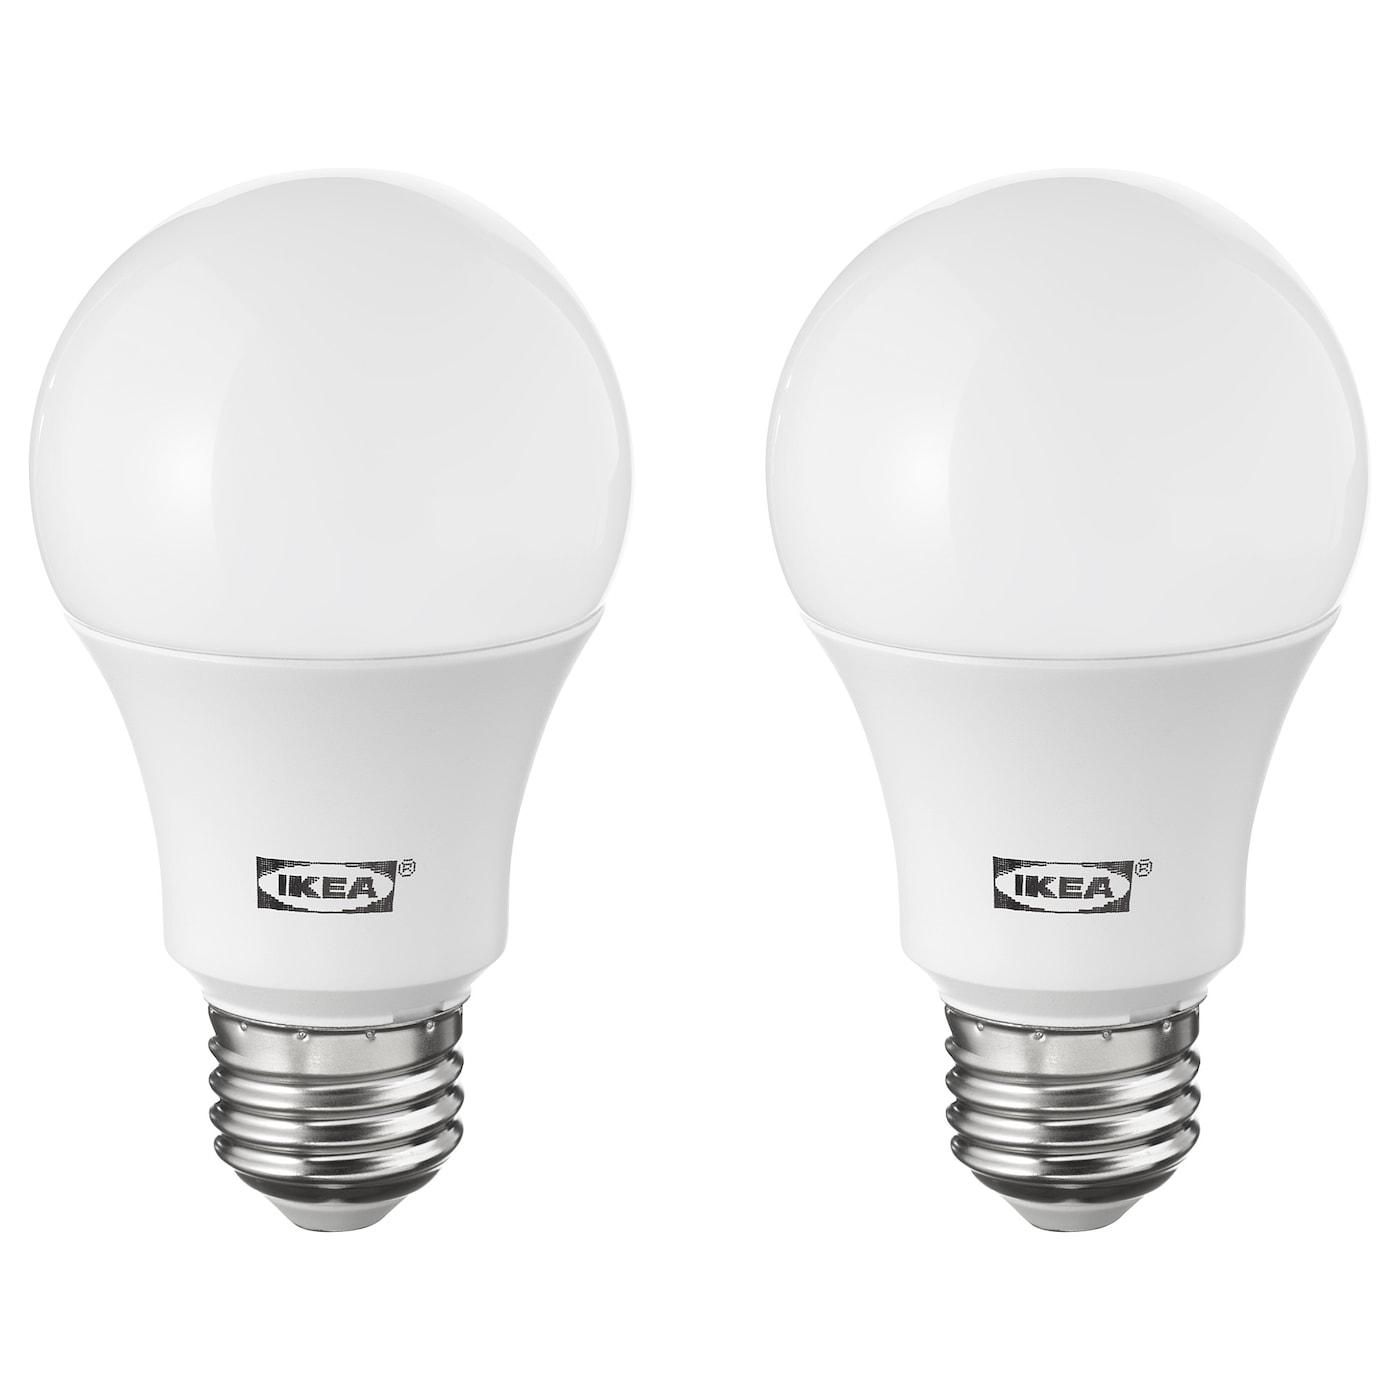 LED Light Bulb 12W Natural Bright White A19 E26Equivalent 100W Incandescent Lamp